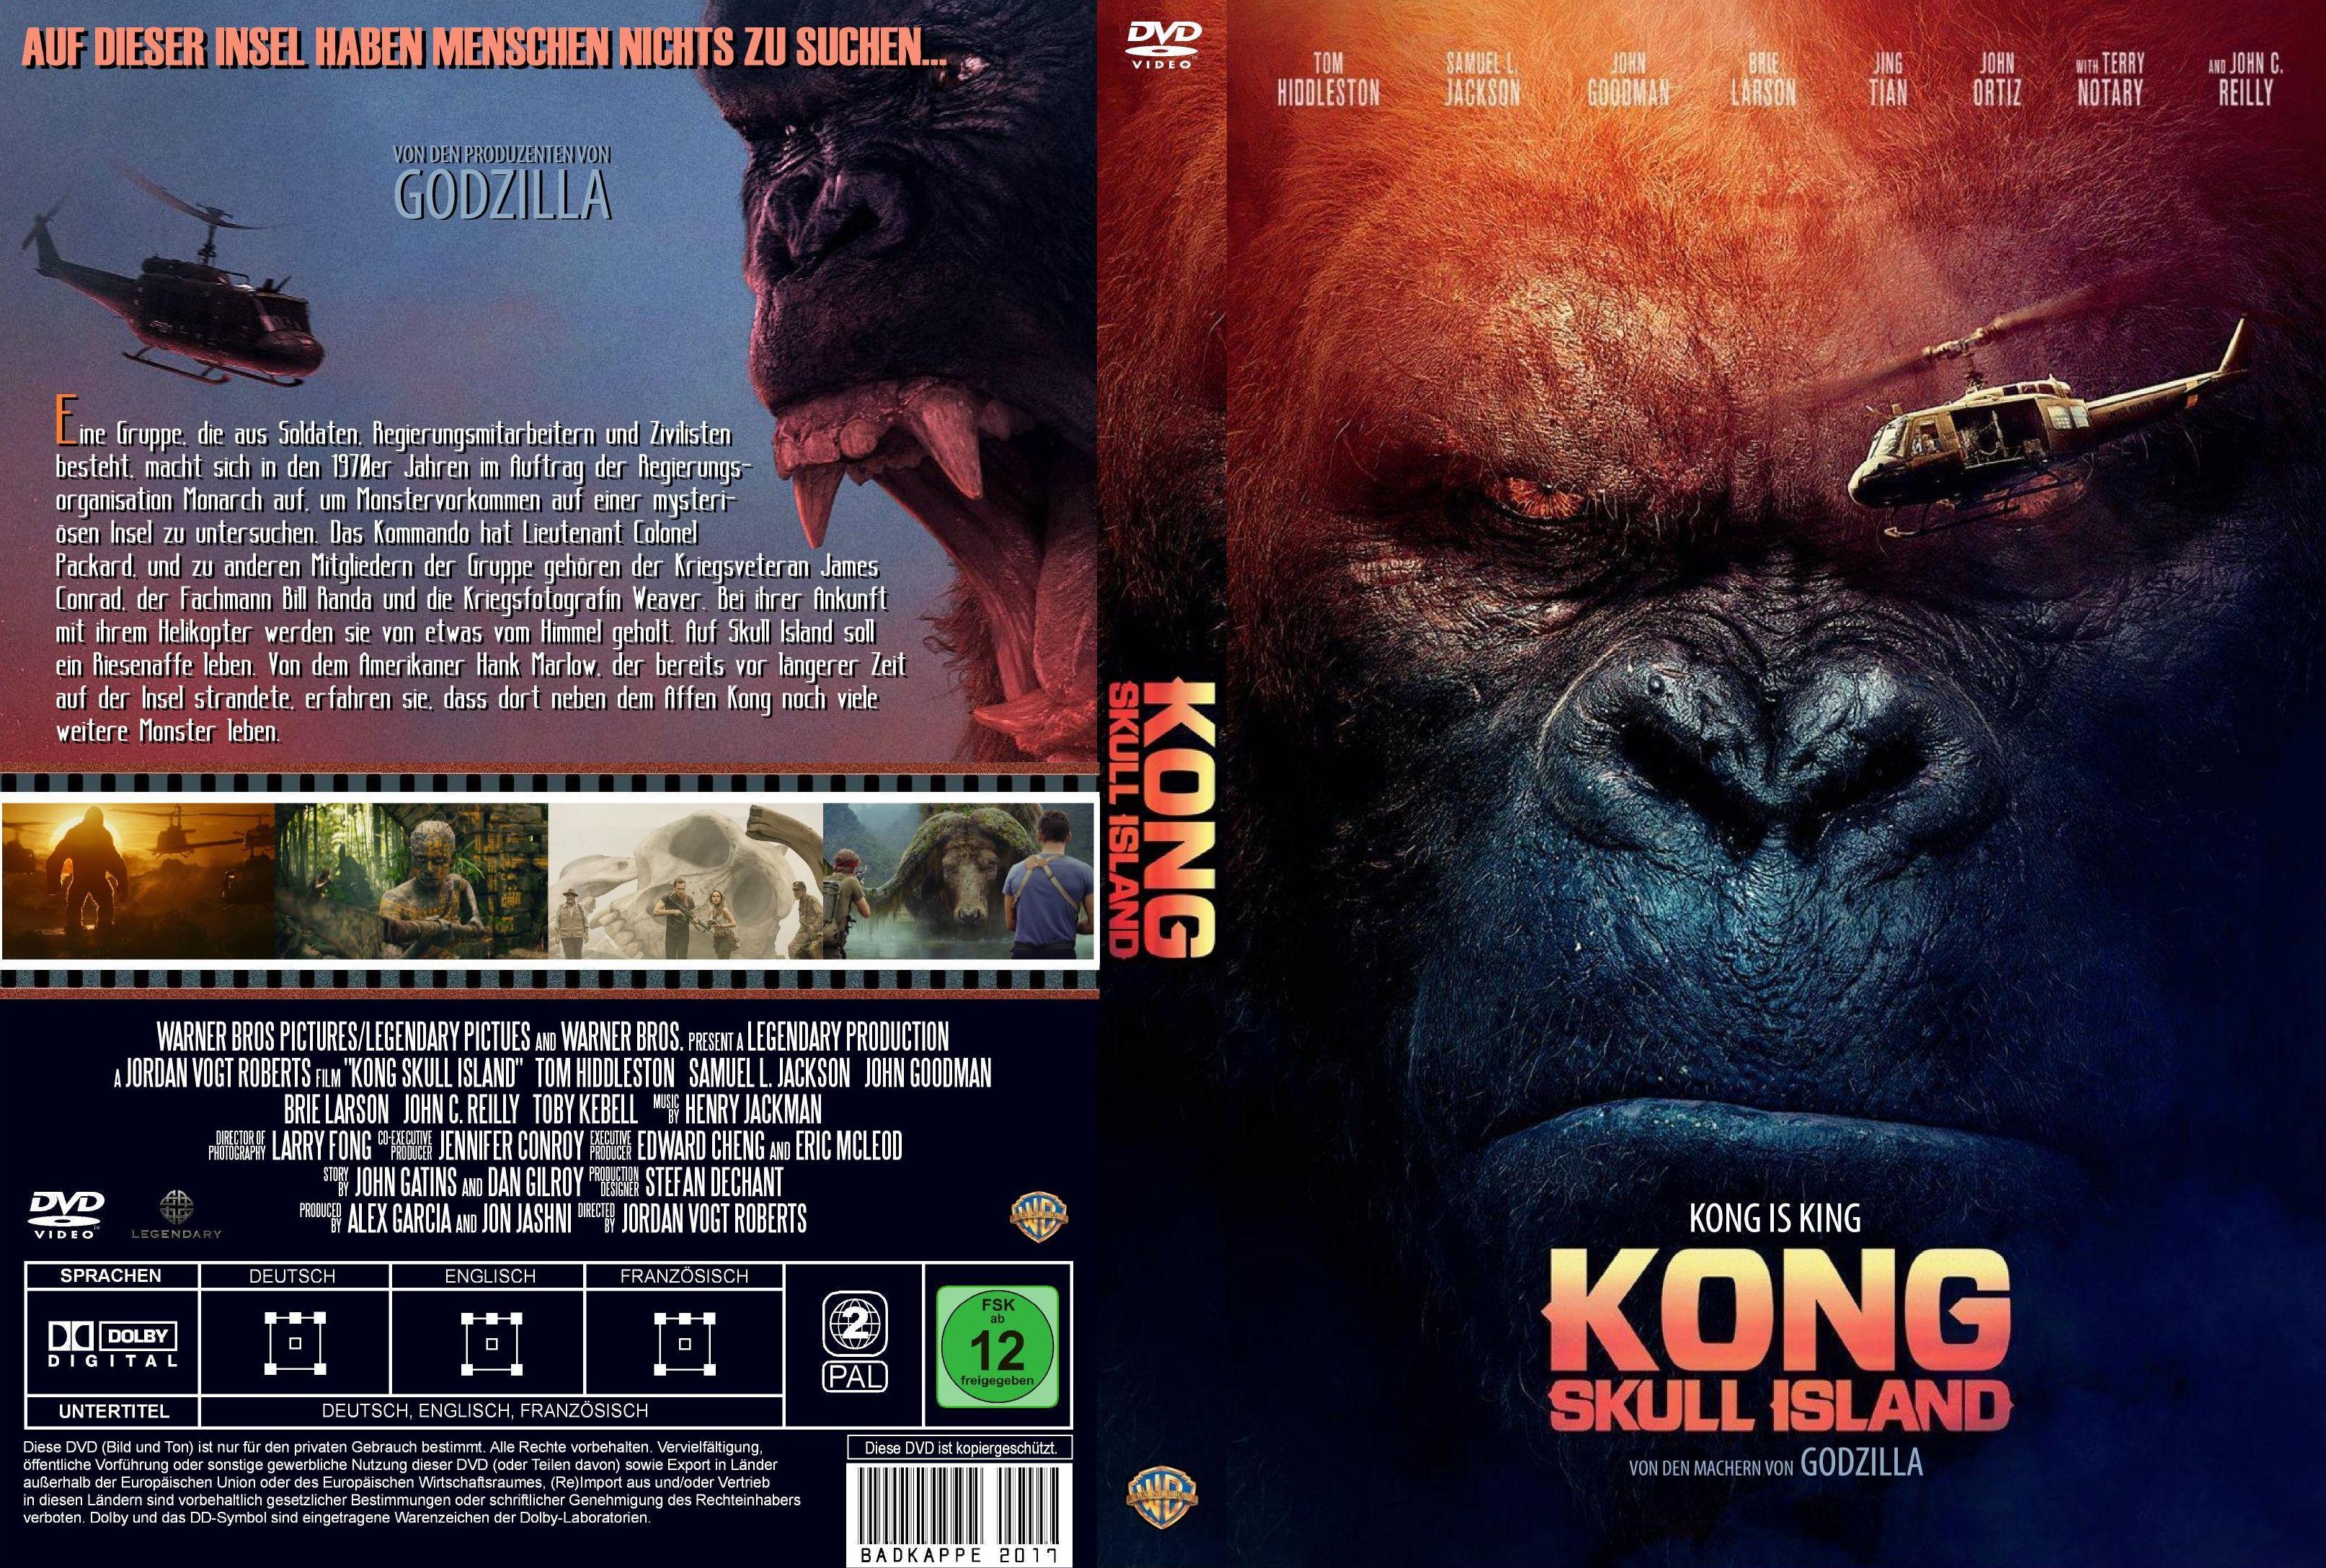 Kong Skull Island (2017) cover